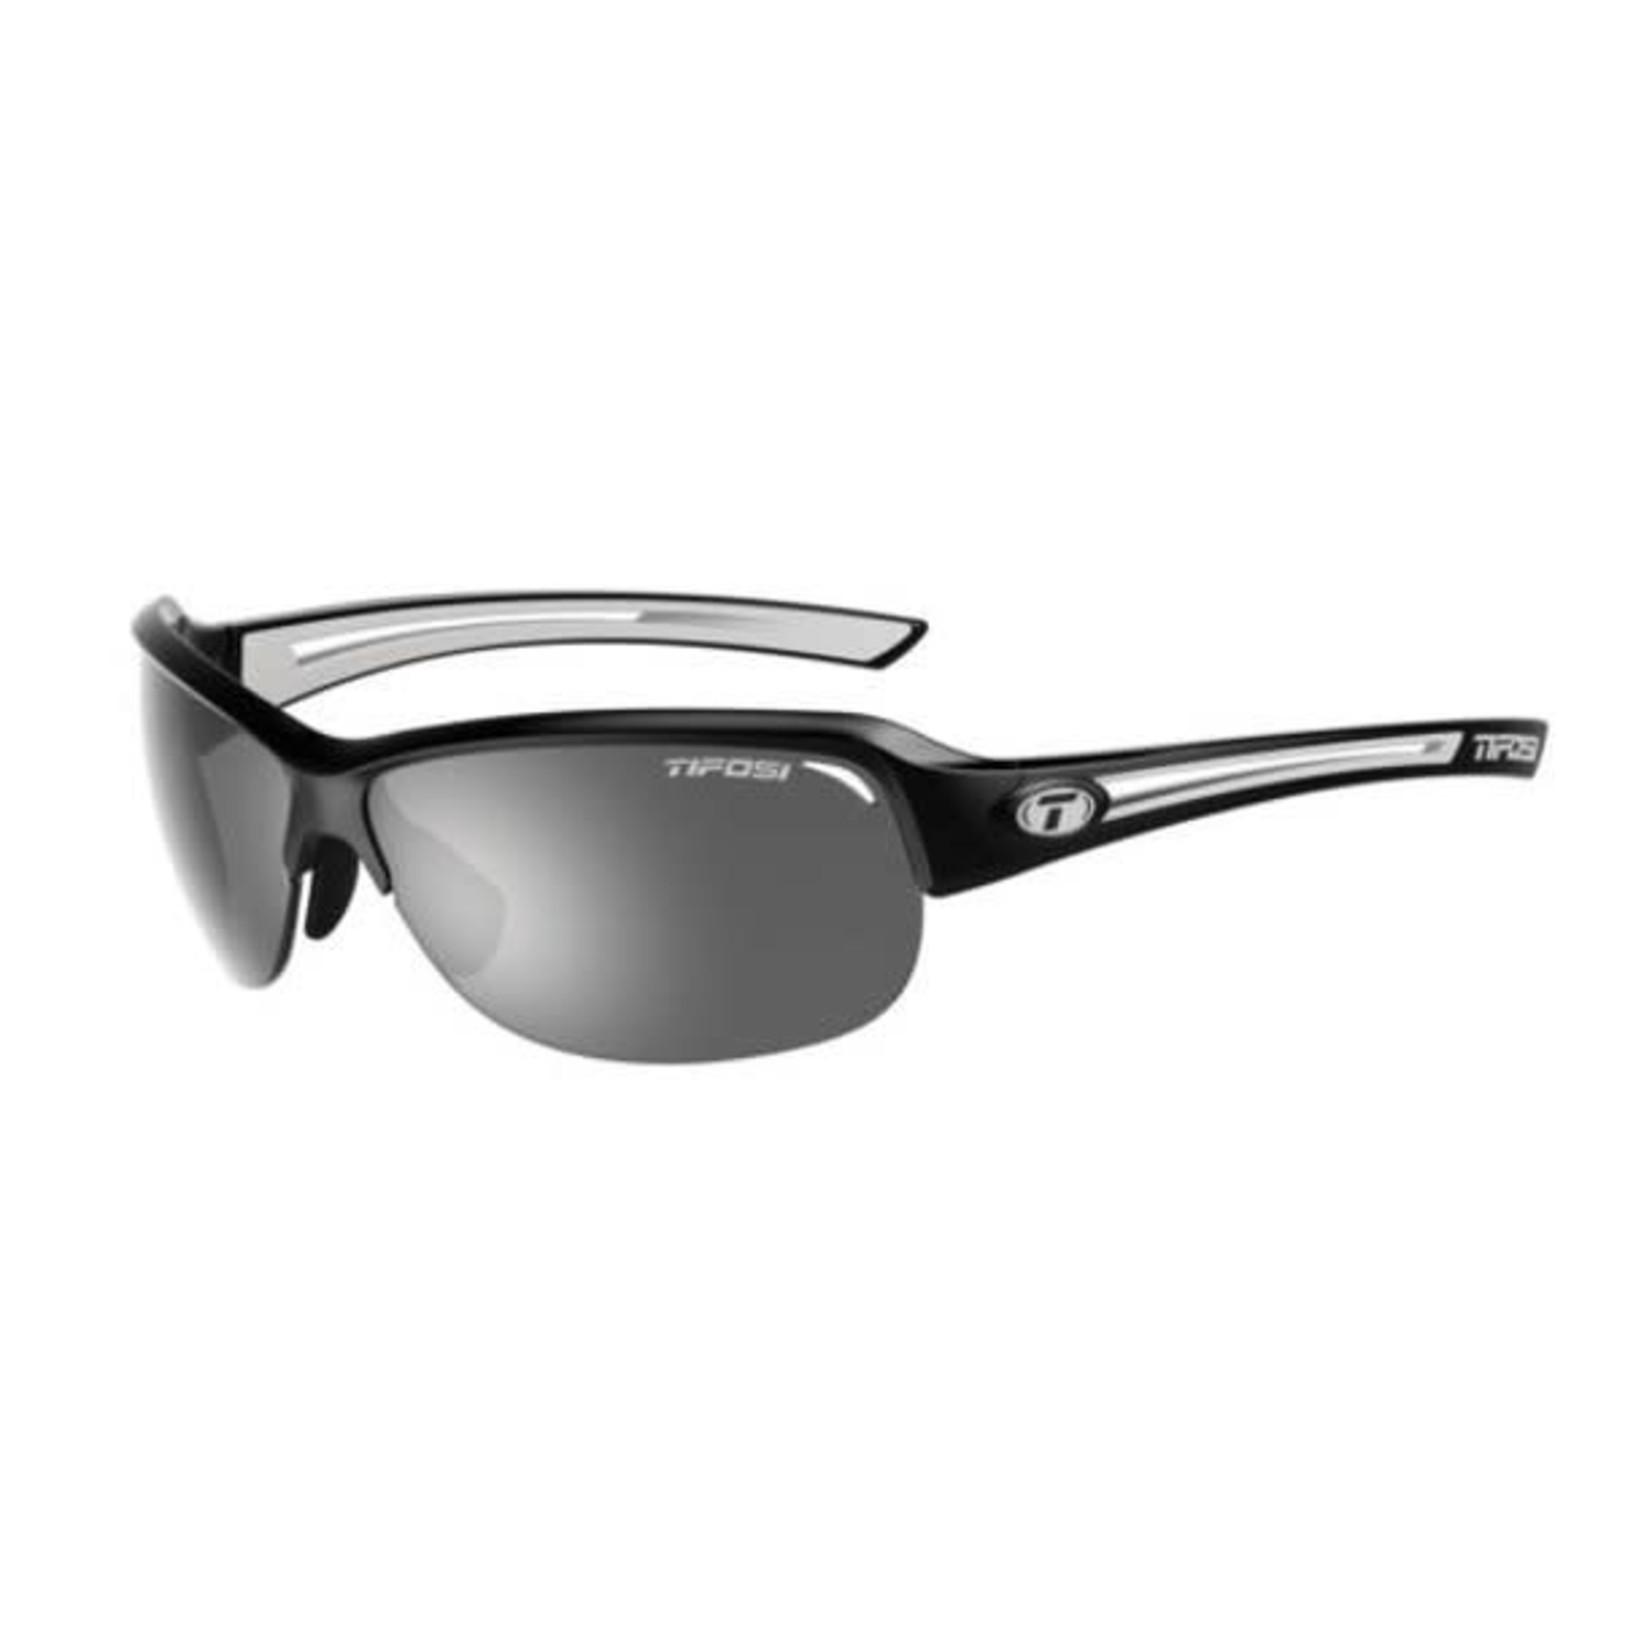 Tifosi Optics Mira Black/White Single Lens Sunglasses Smoke